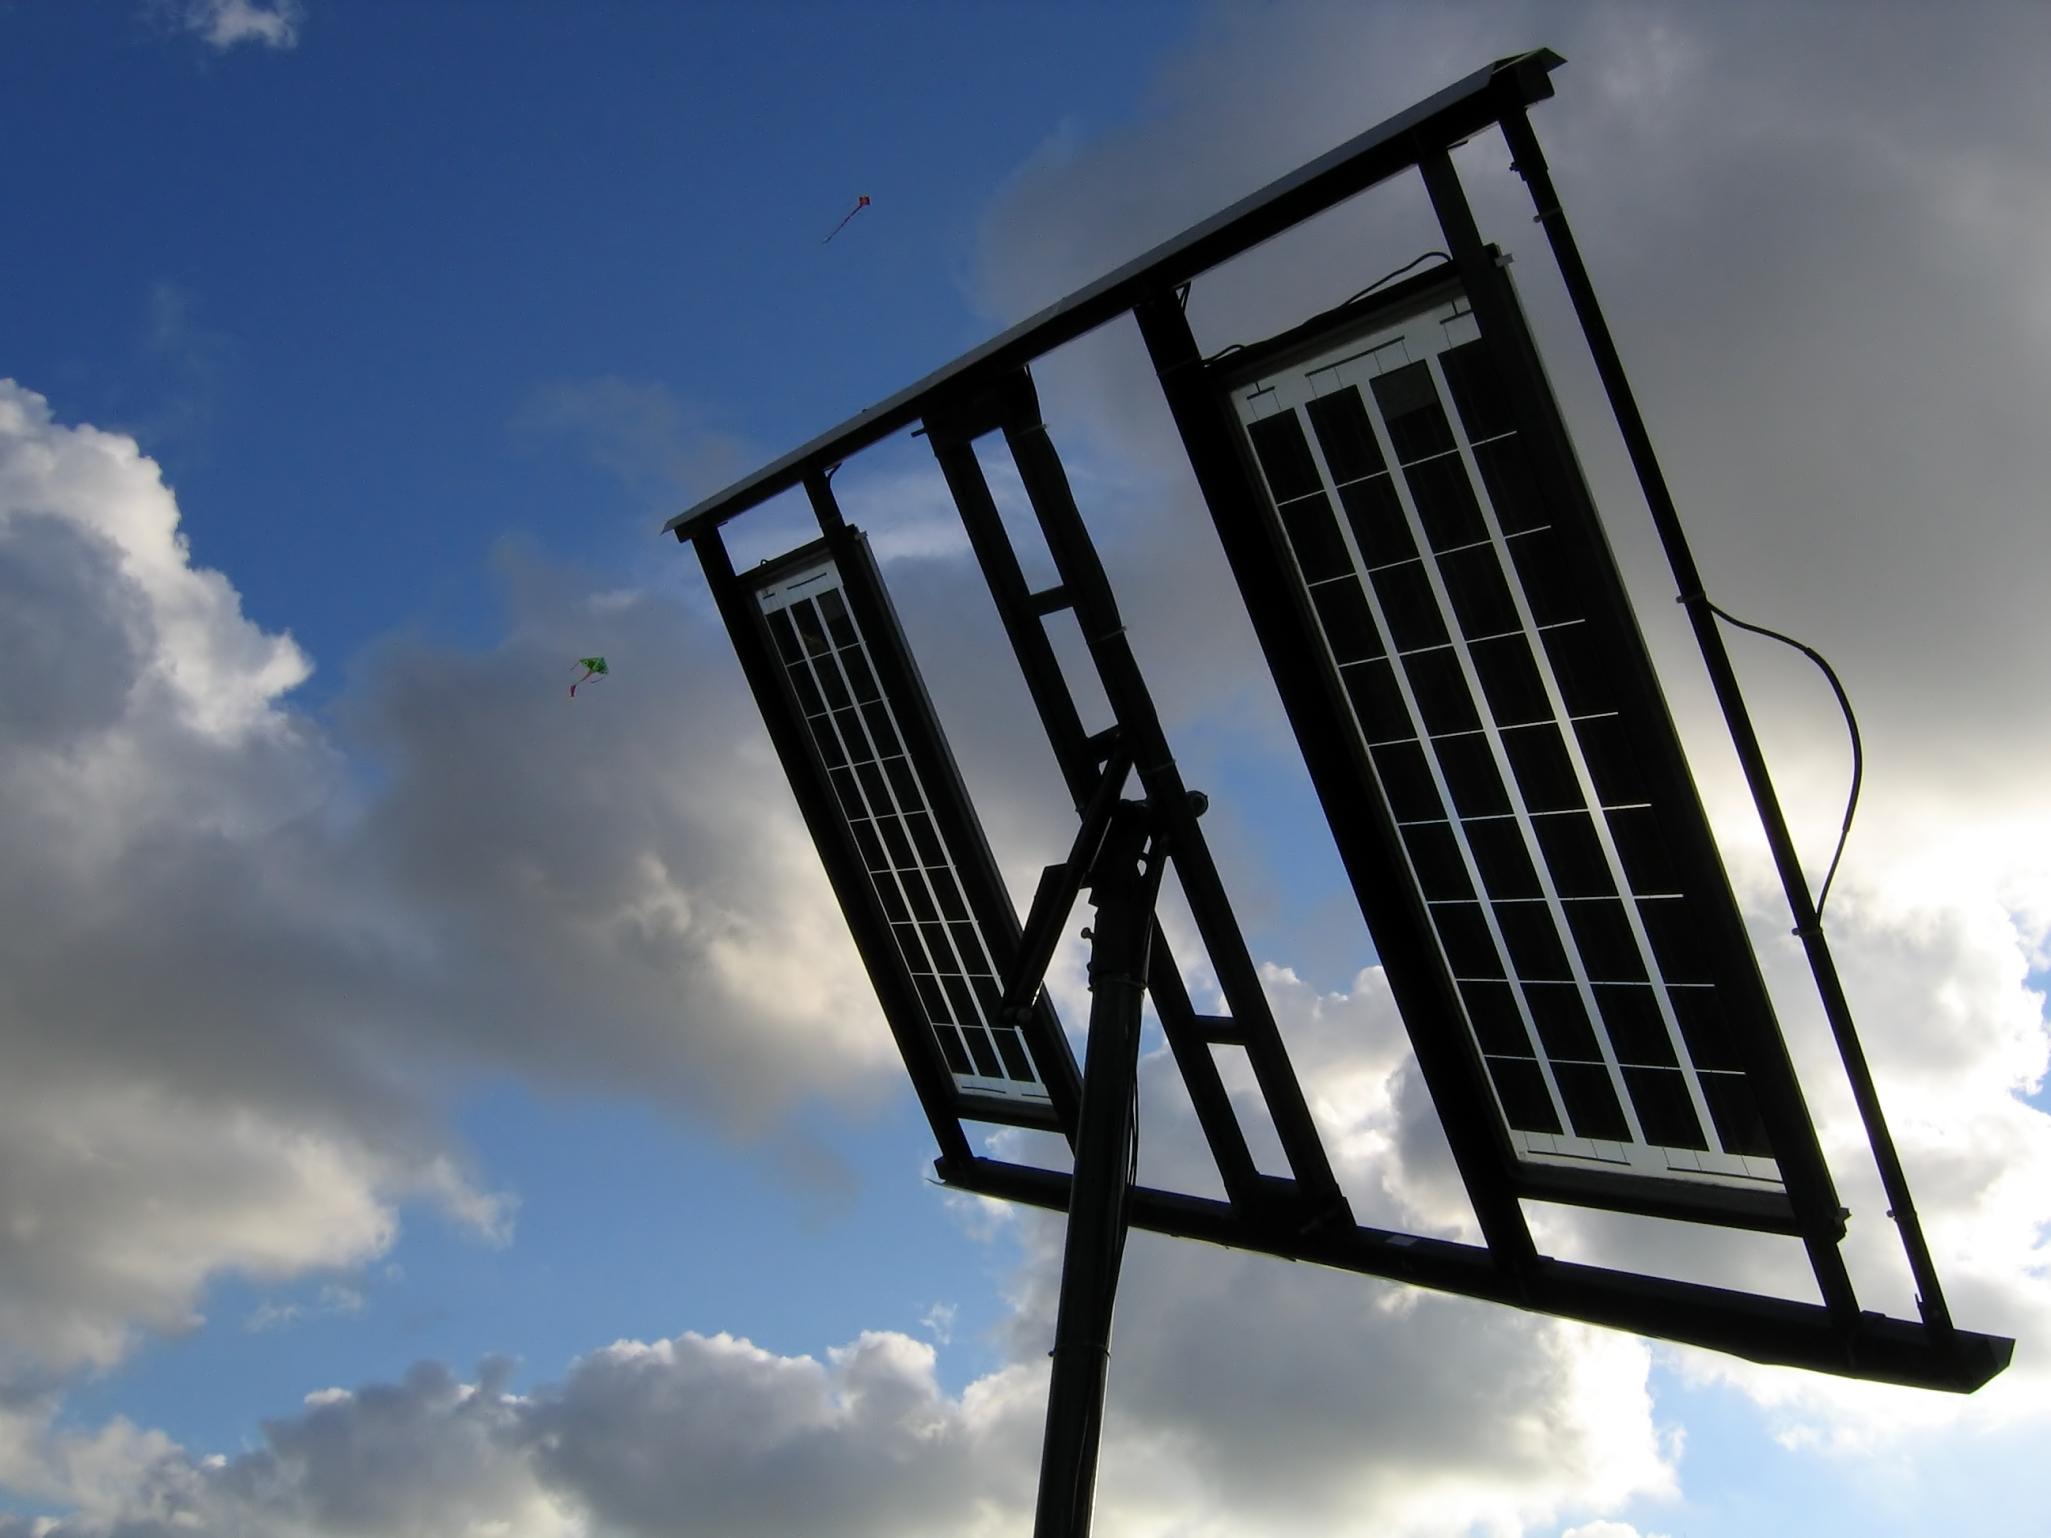 Solar Panels, Azure, Pole, Weather, Stratus, HQ Photo